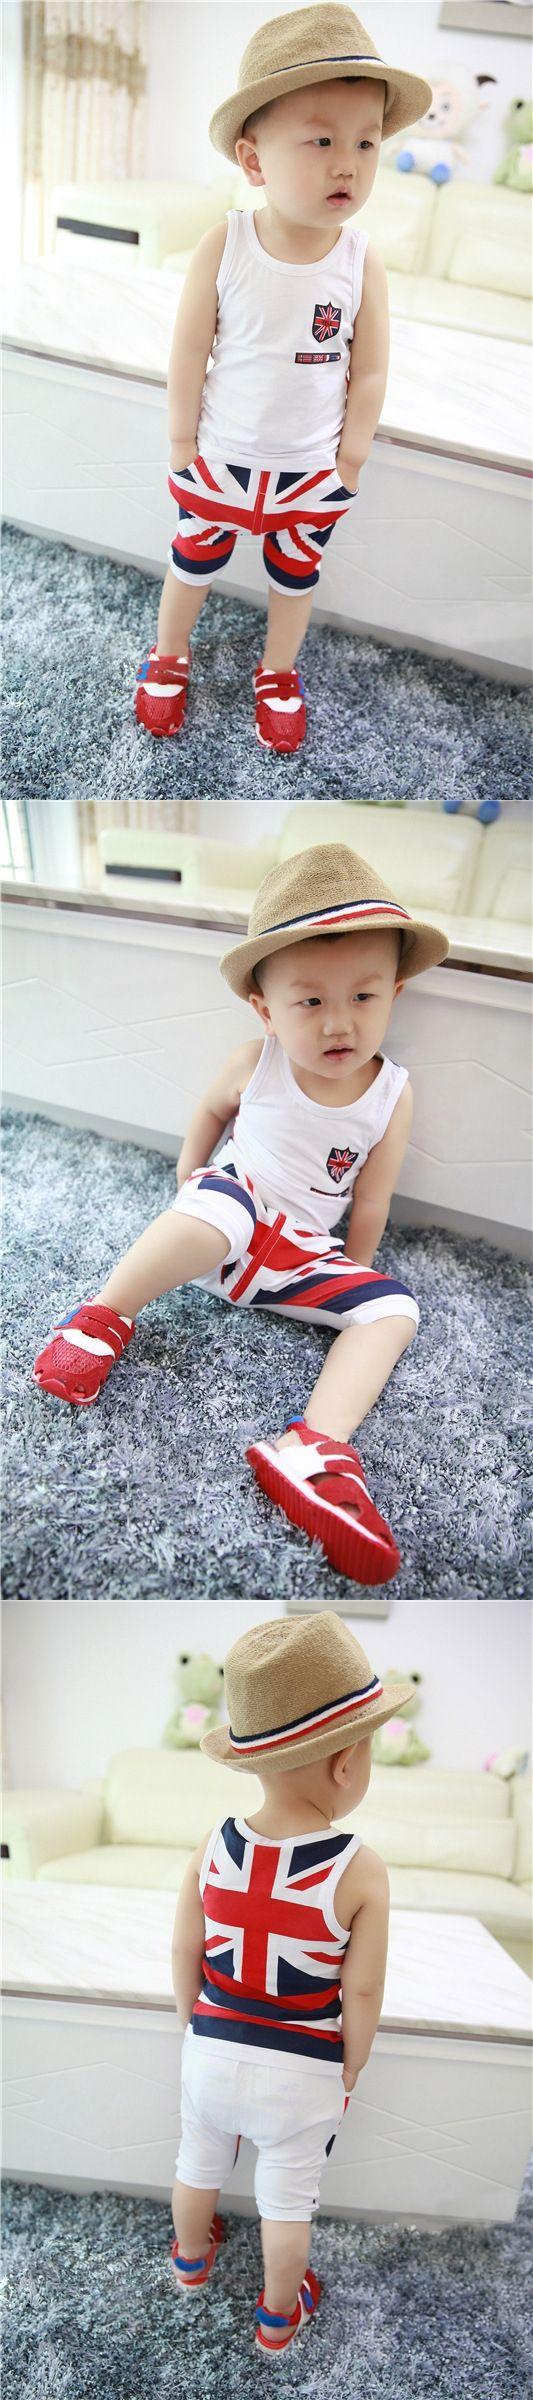 boys clothes UK flag Vest + Short baby boy set summer style 2017 children's sets kids clothing 0-4 years old